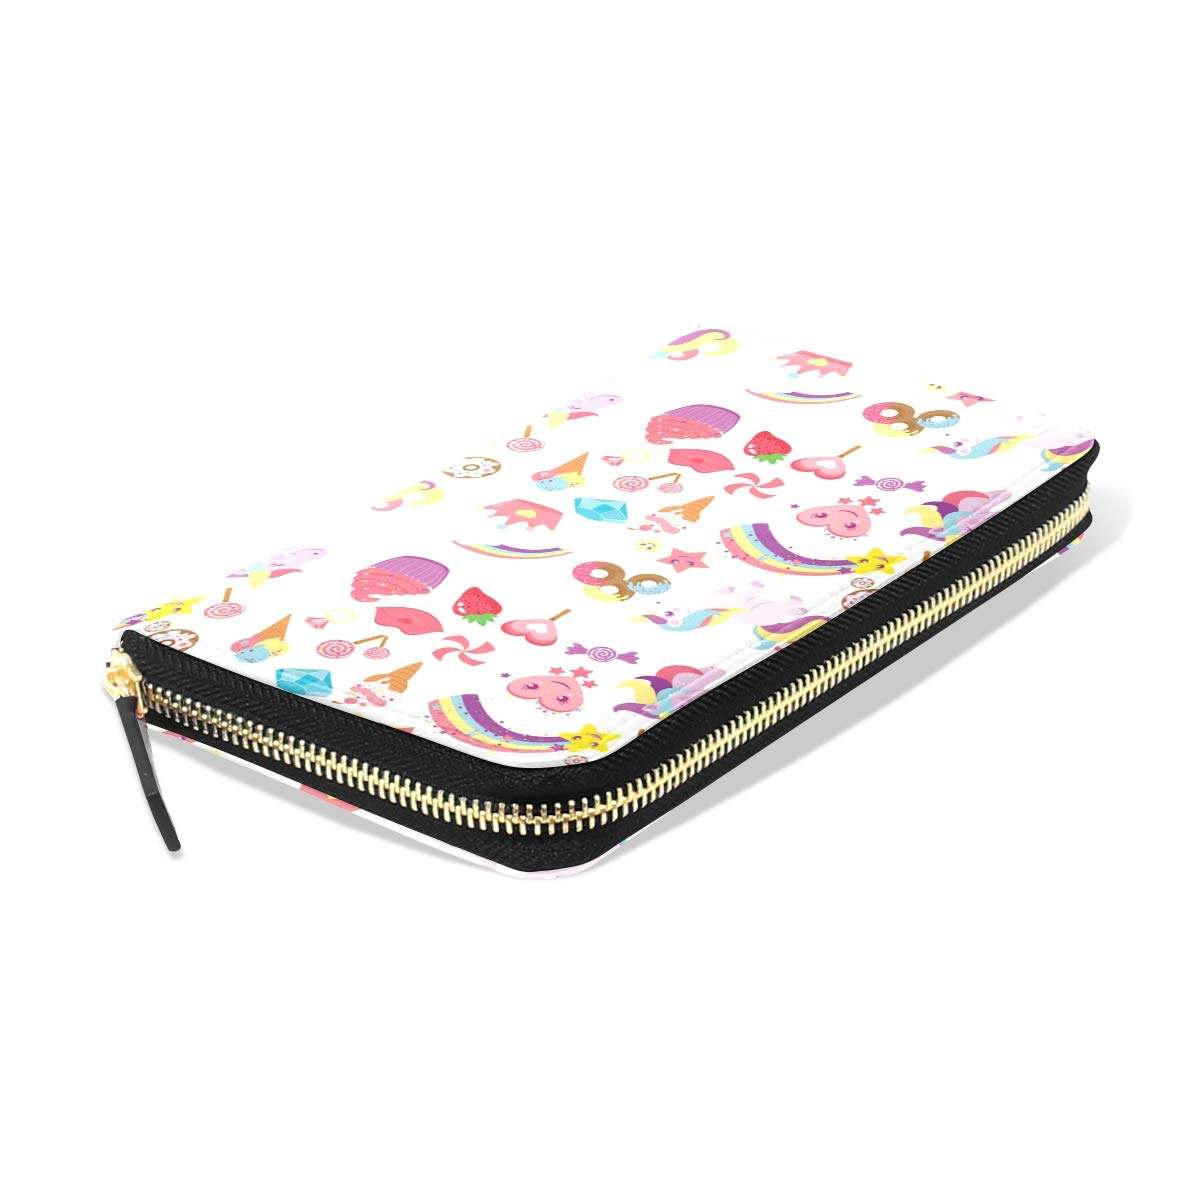 Women LeatherCute Unicorns StarWallet Large Capacity Zipper Travel Wristlet Bags Clutch Cellphone Bag